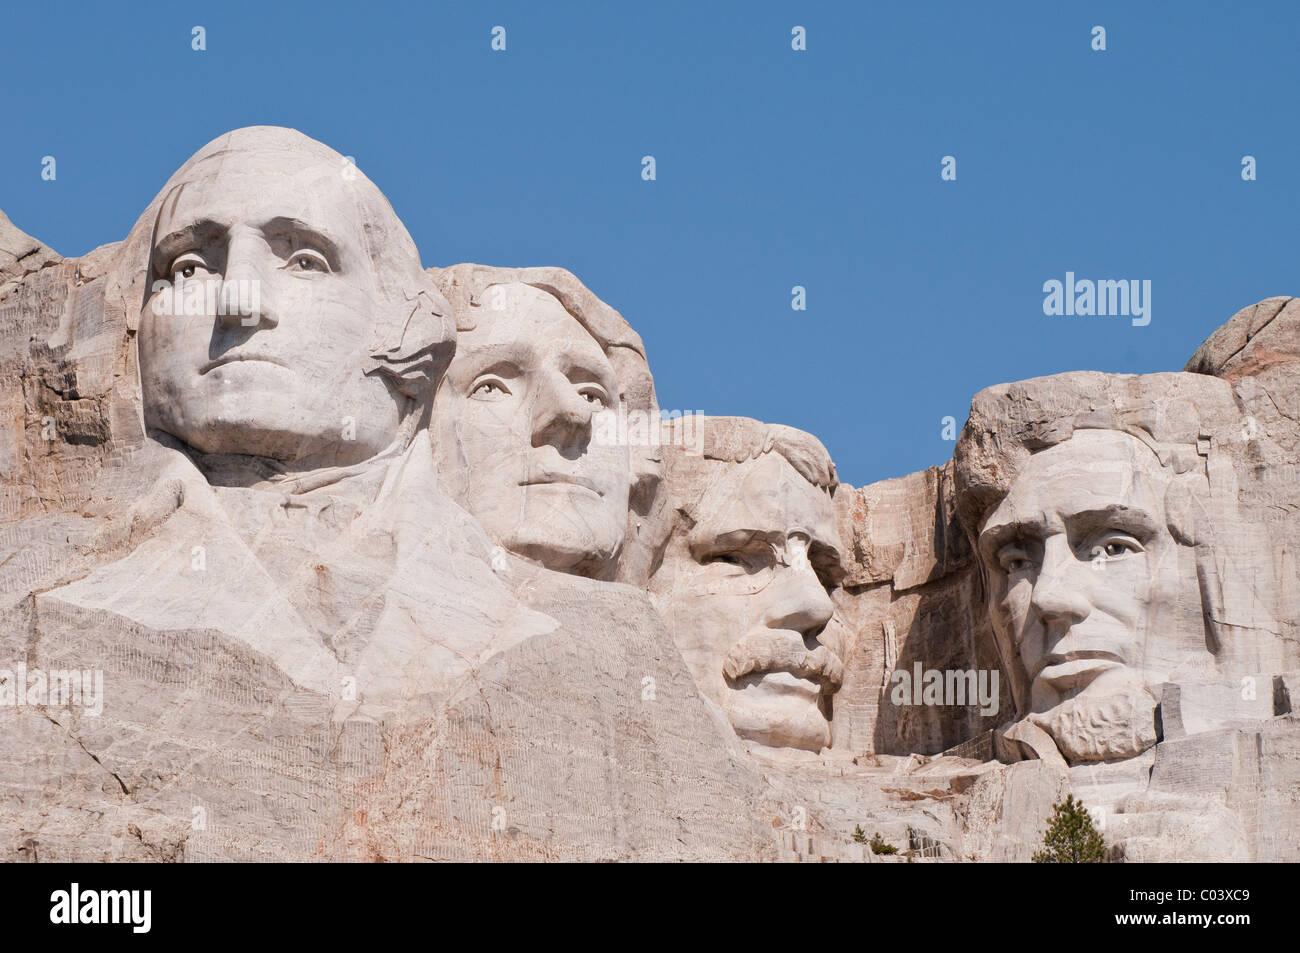 Presidents Faces Stock Photos Amp Presidents Faces Stock